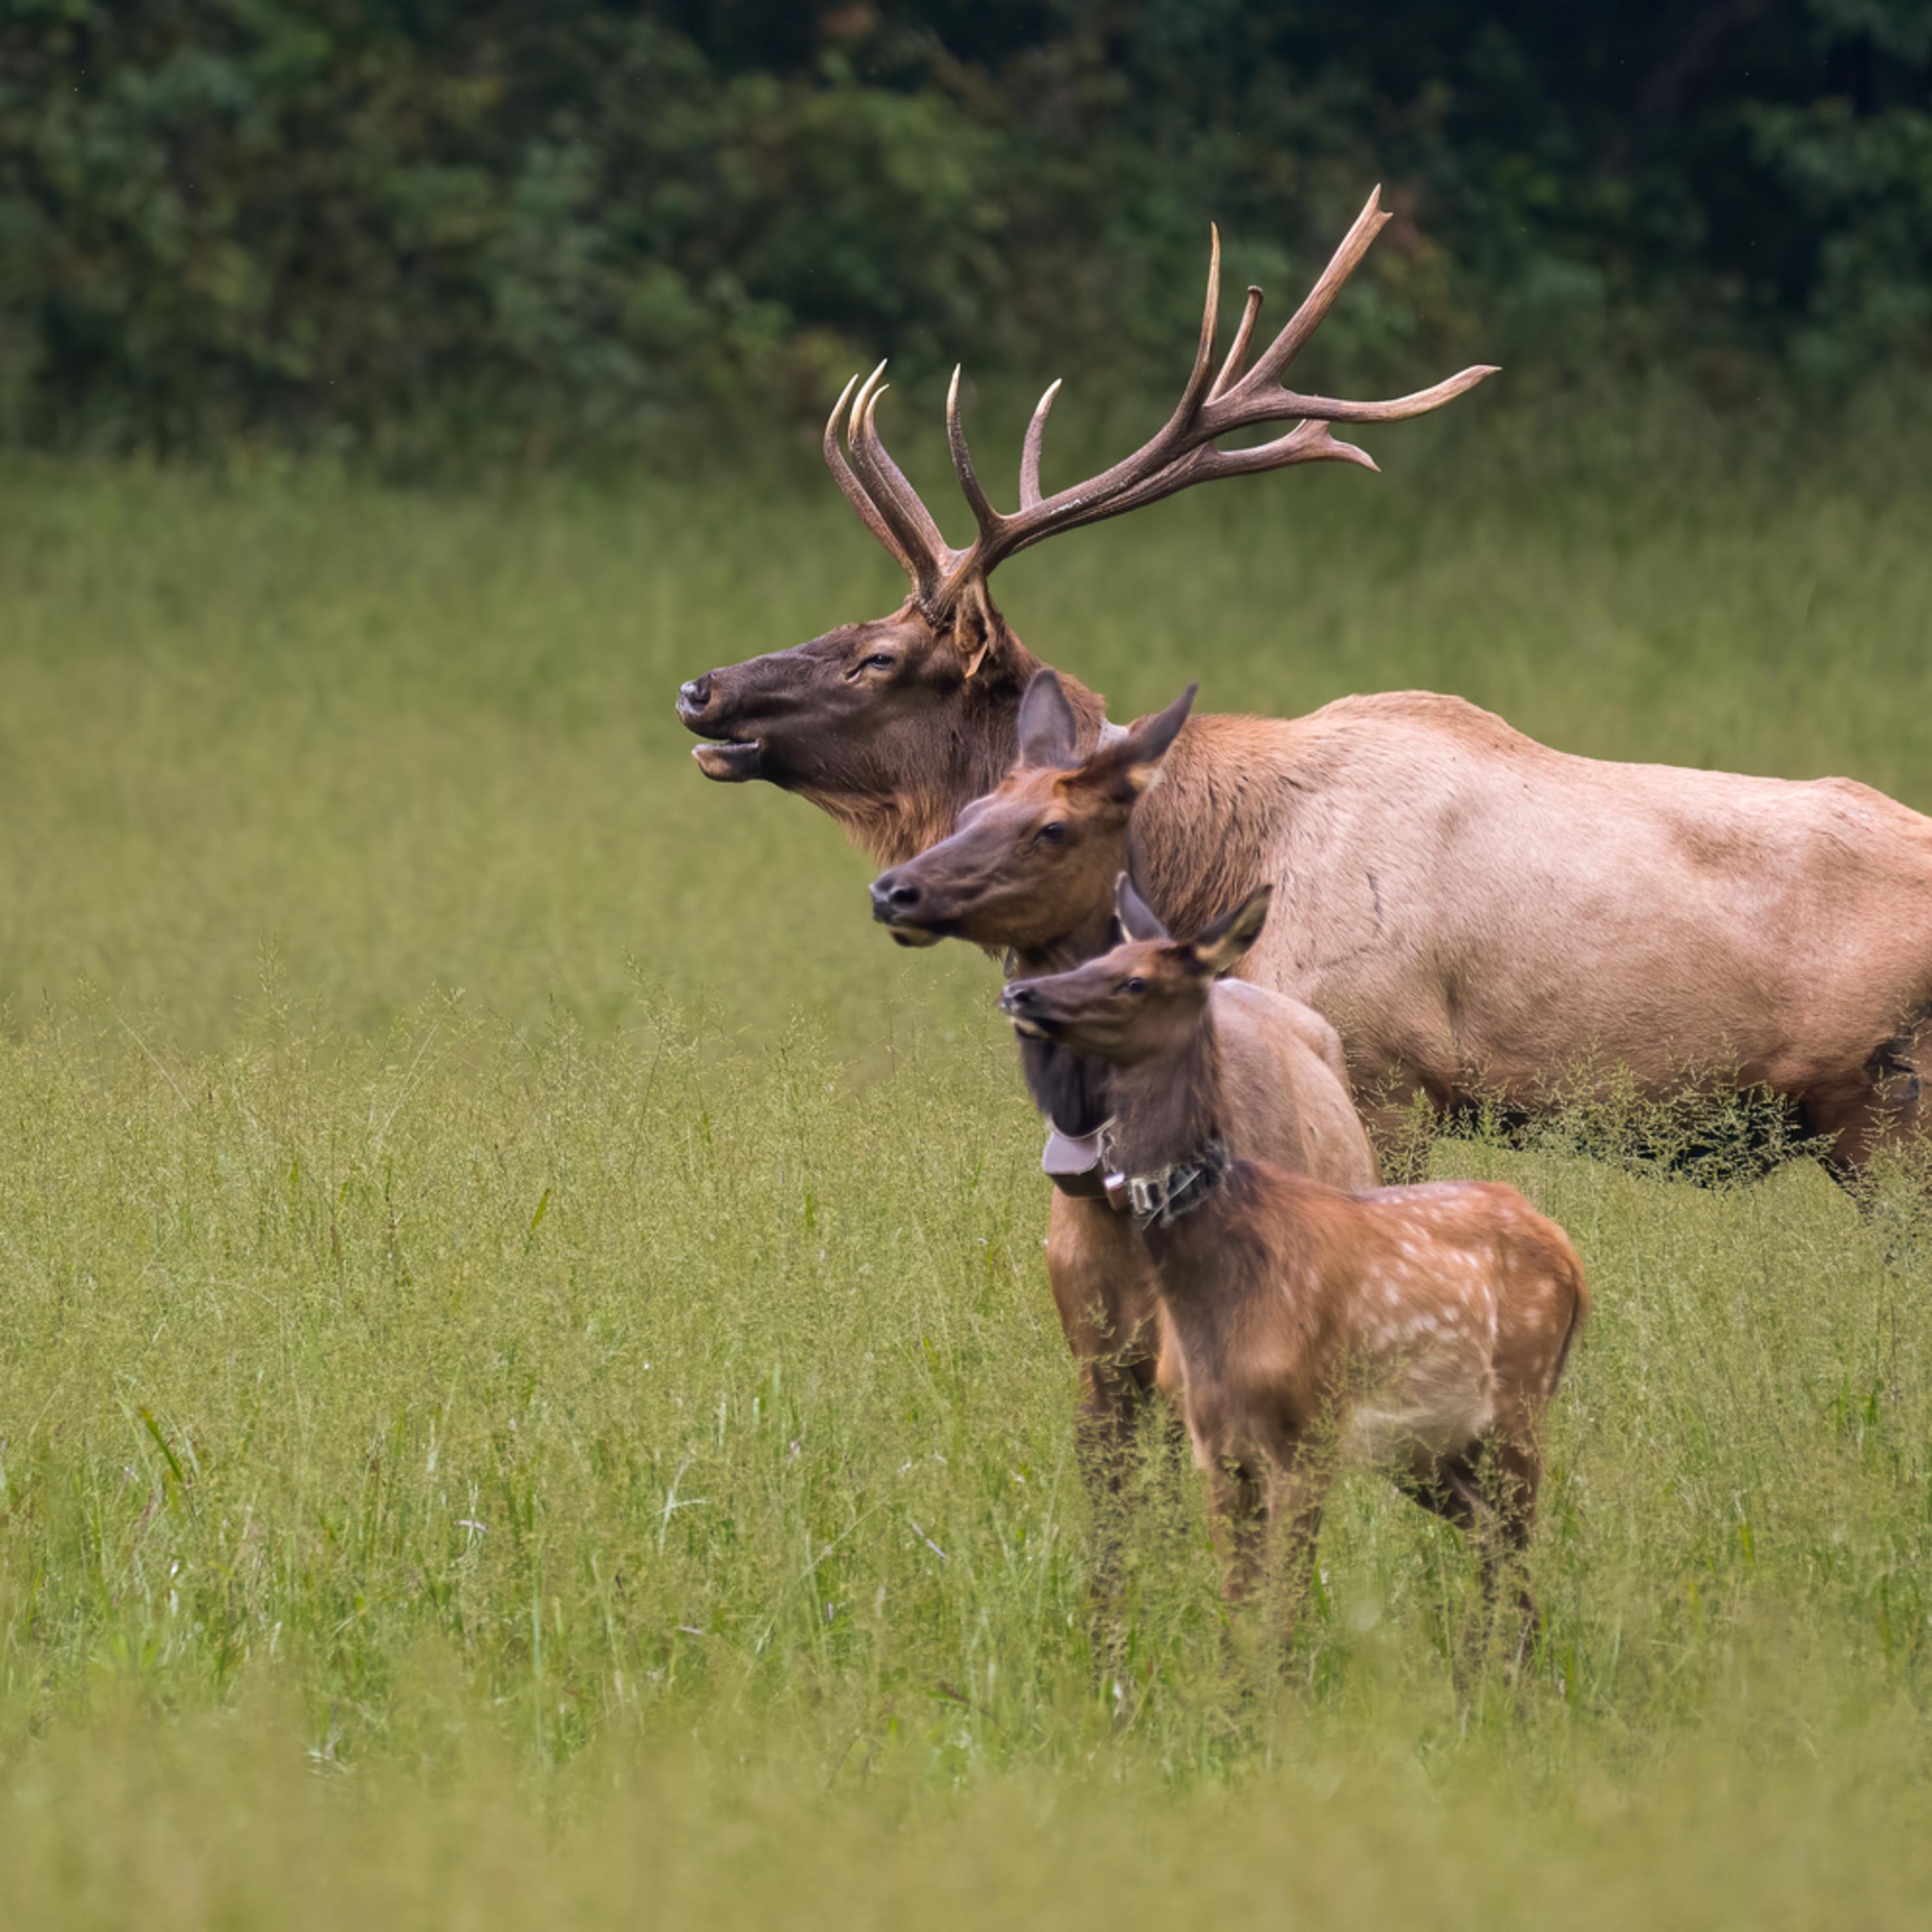 Cataloochee nc bull cow calf genrations hvgwce